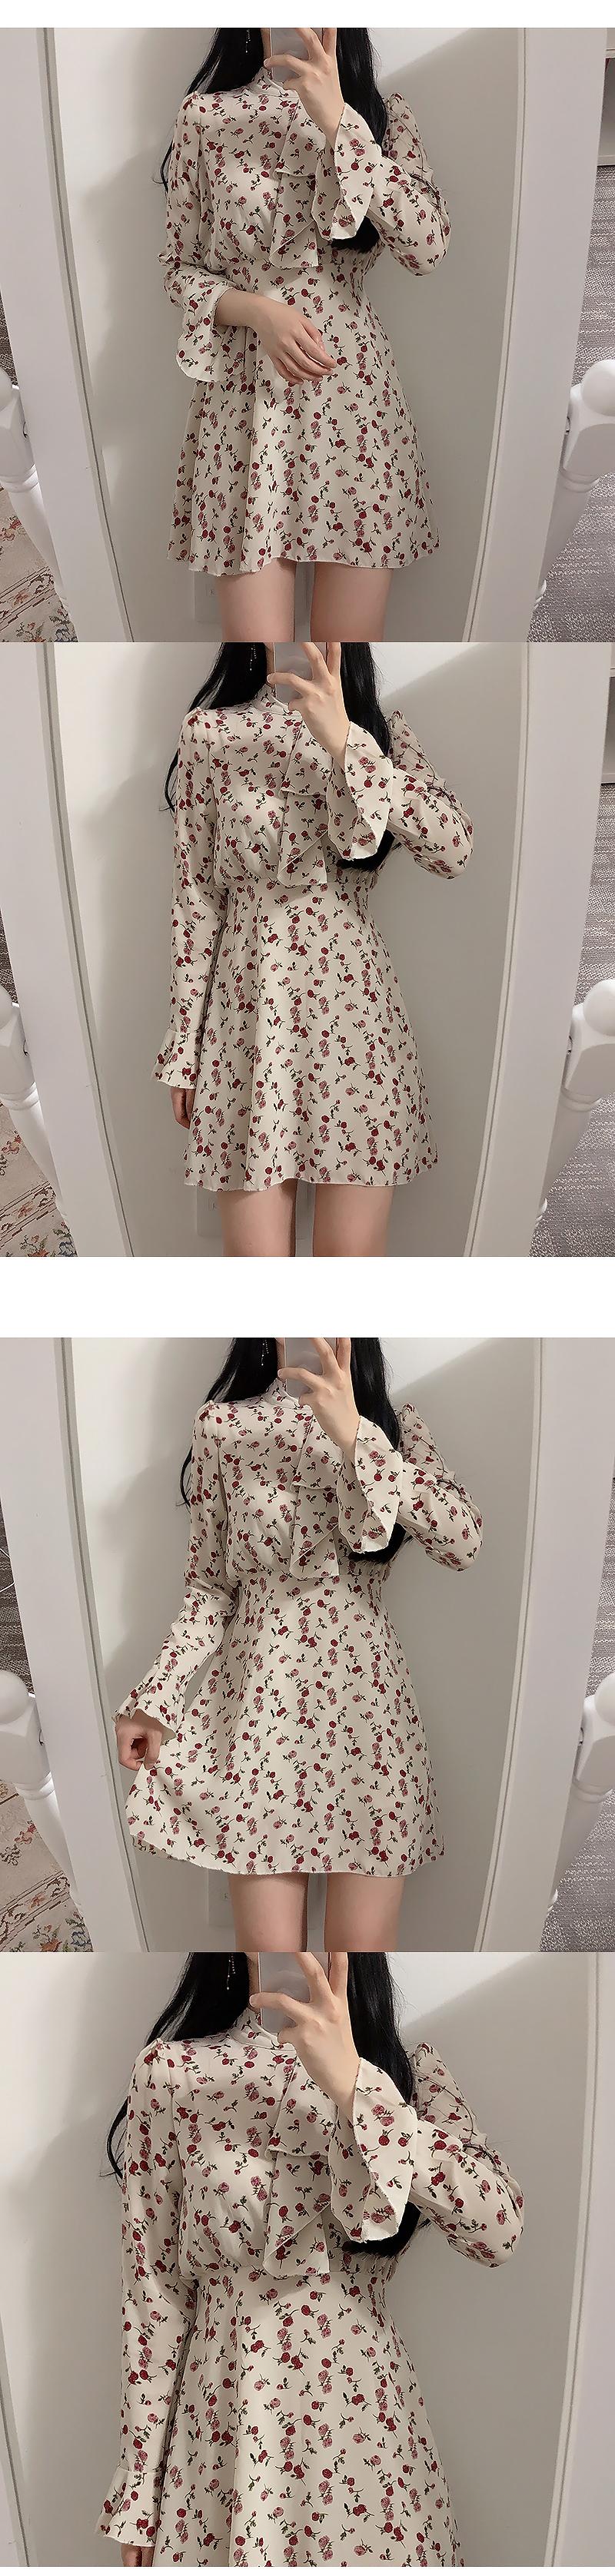 Runaway ♥ romance flower dress